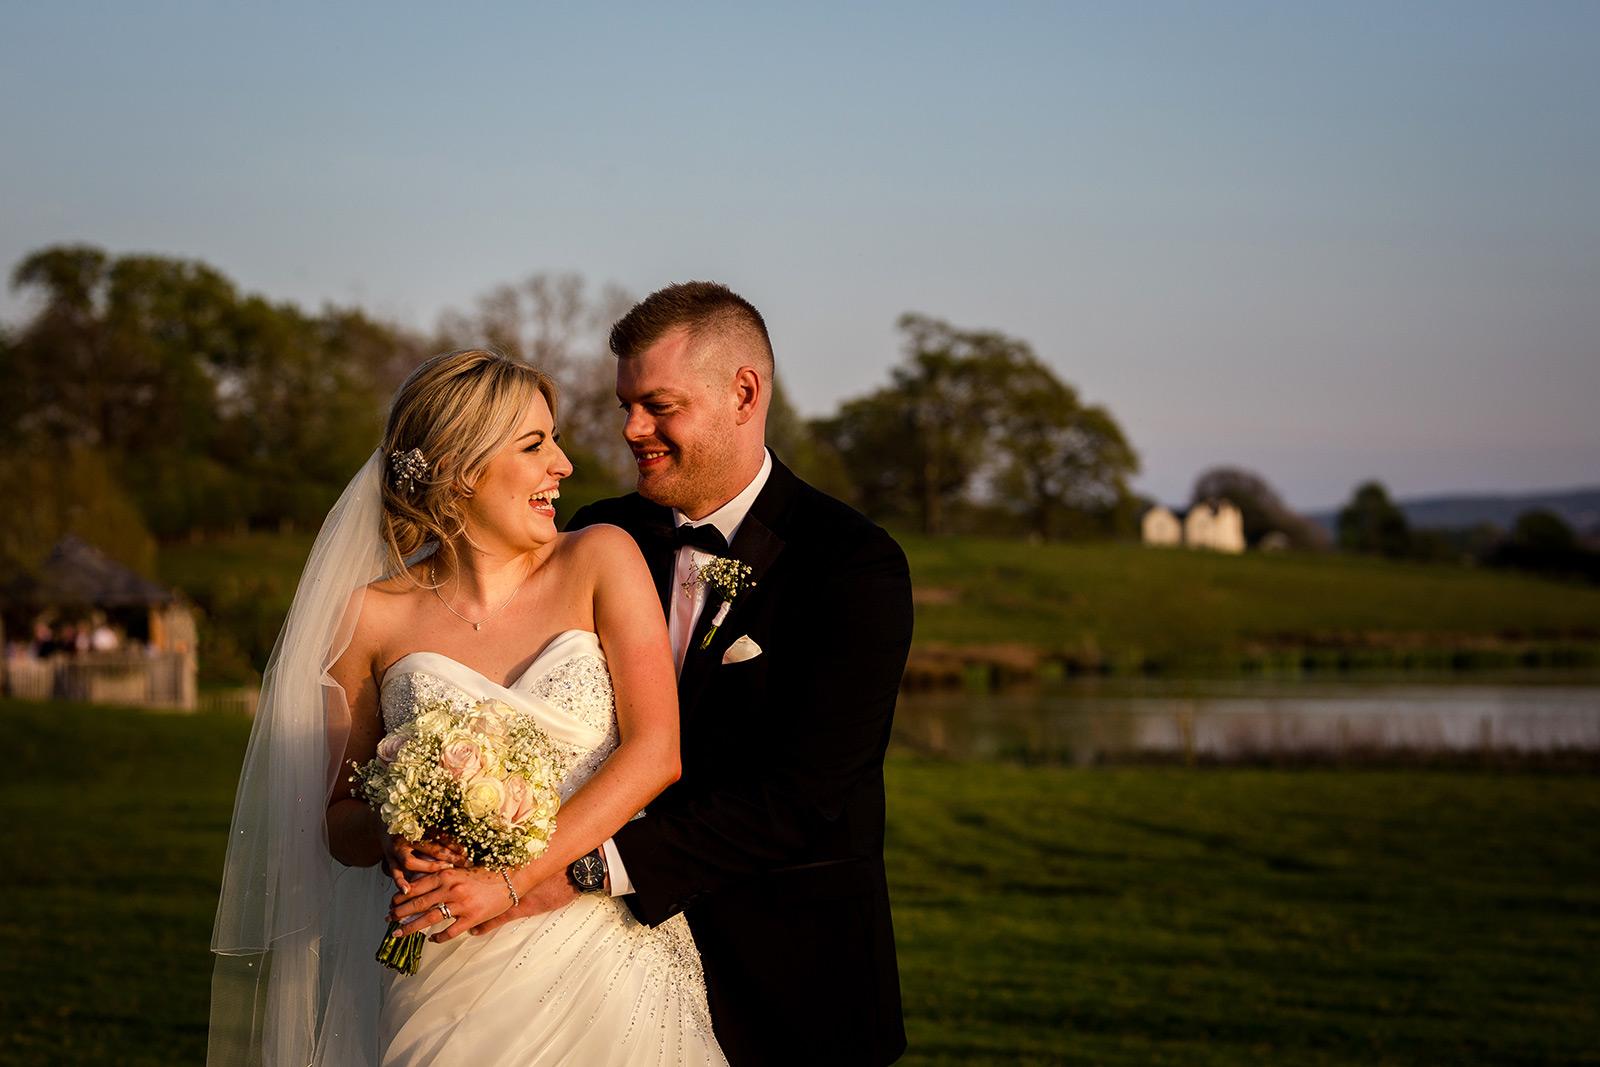 Bride and groom at their Sandhole Oak Barn Wedding